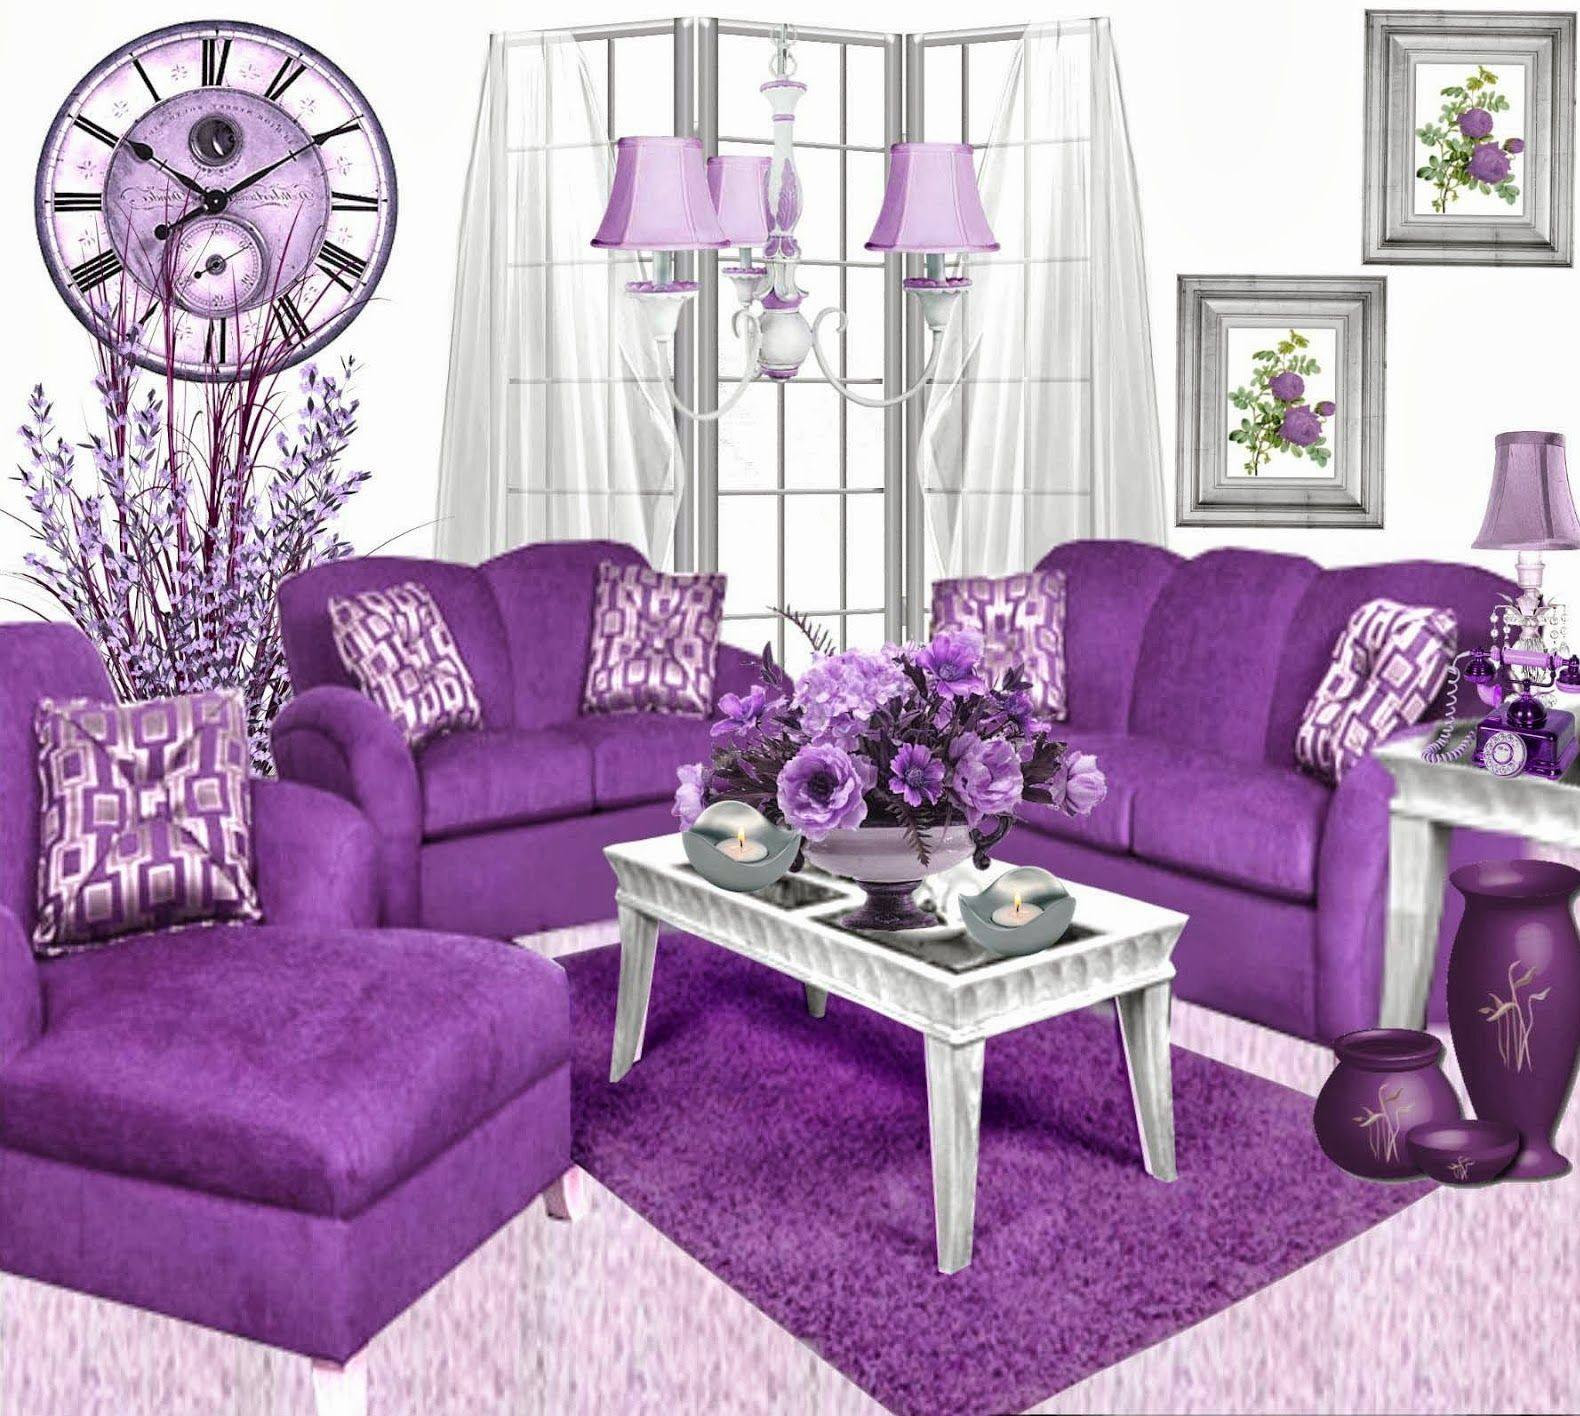 Purple Living Room Ideas - Terrys Fabrics's Blog